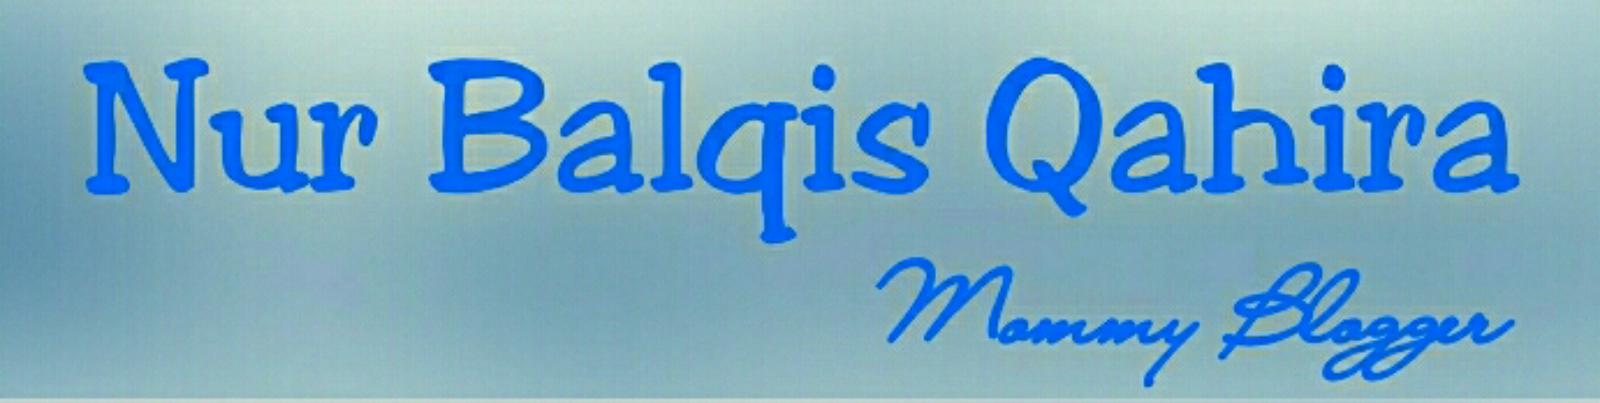 Blog Nur Balqis Qahira